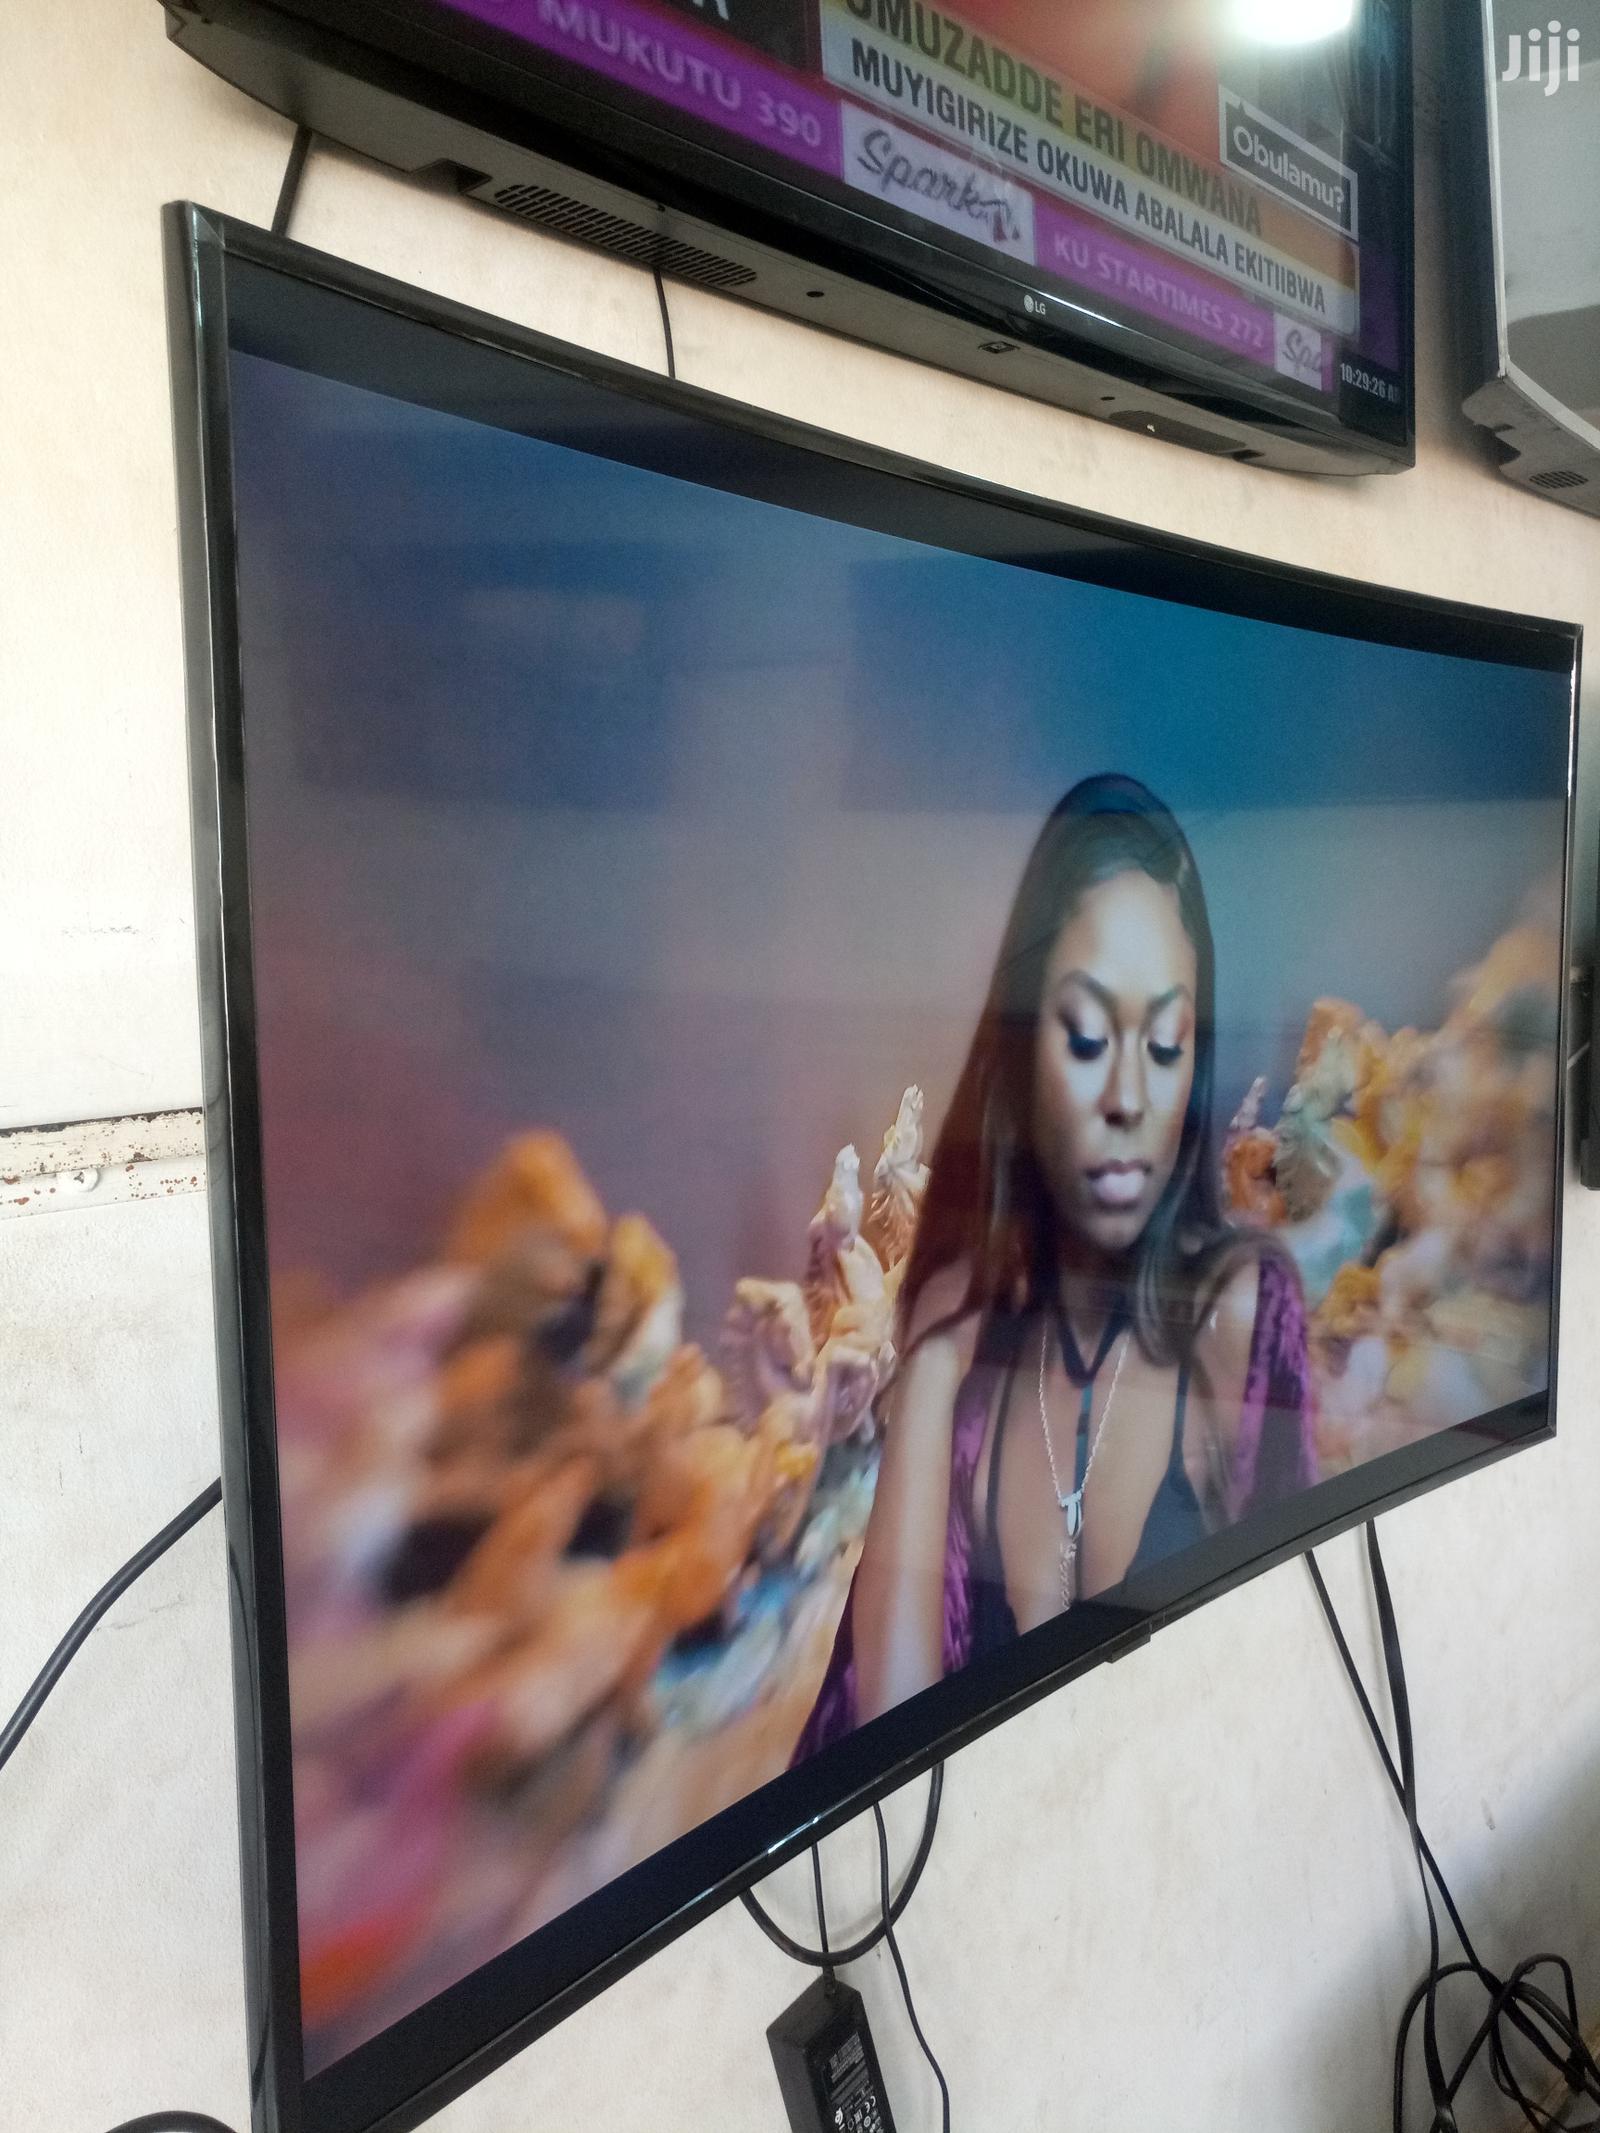 Samsung Curved RU Smart UHD 4k Digital TV 55 Inches